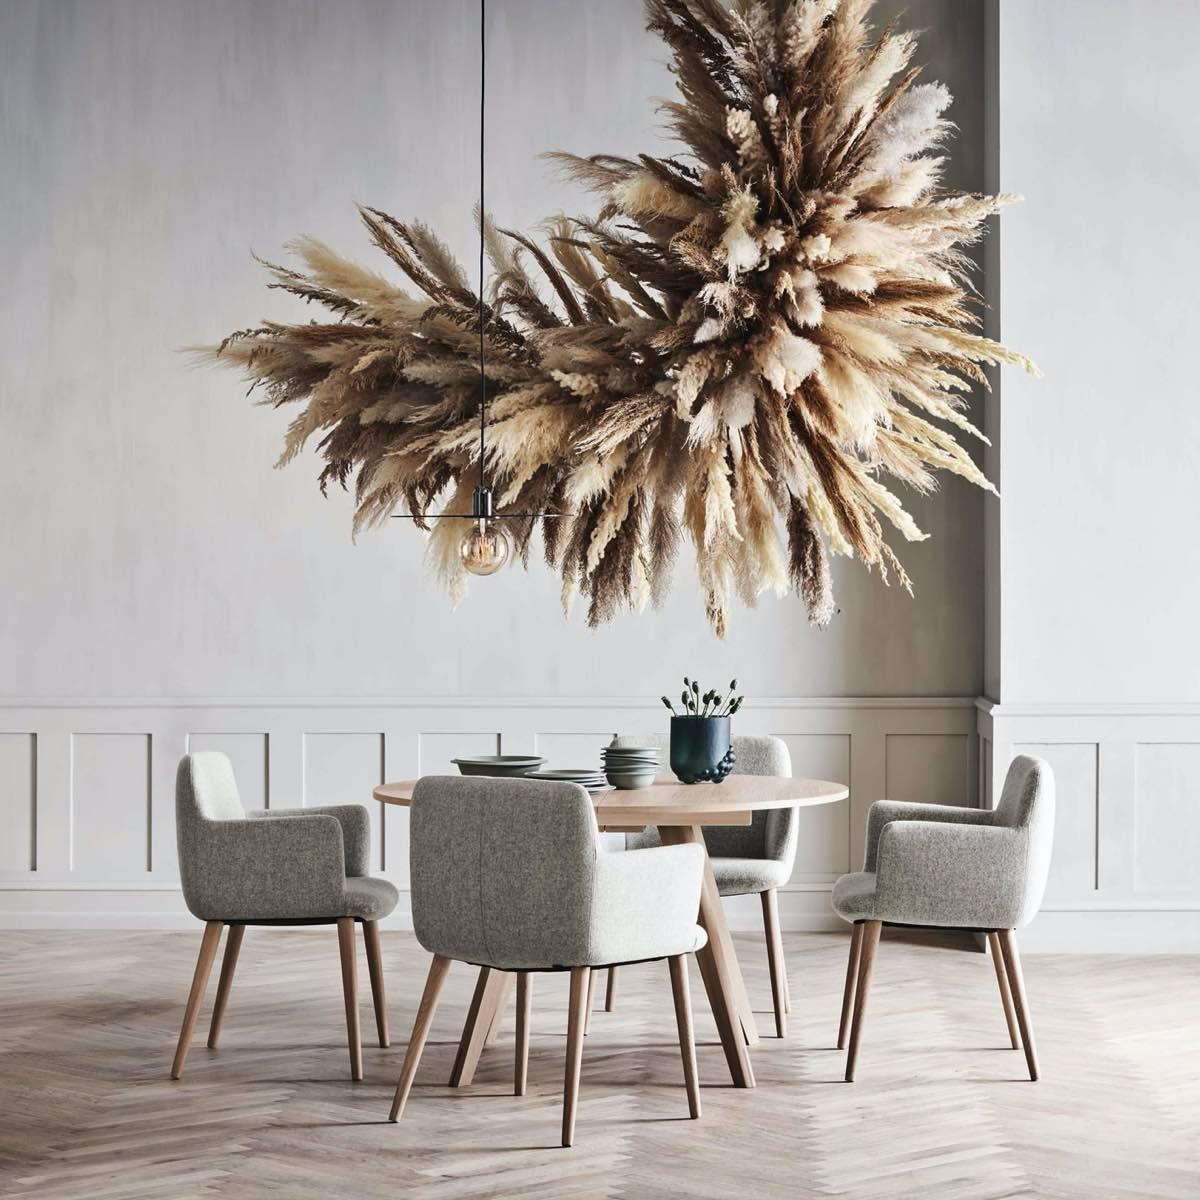 Bolia Ninove new mood tafel